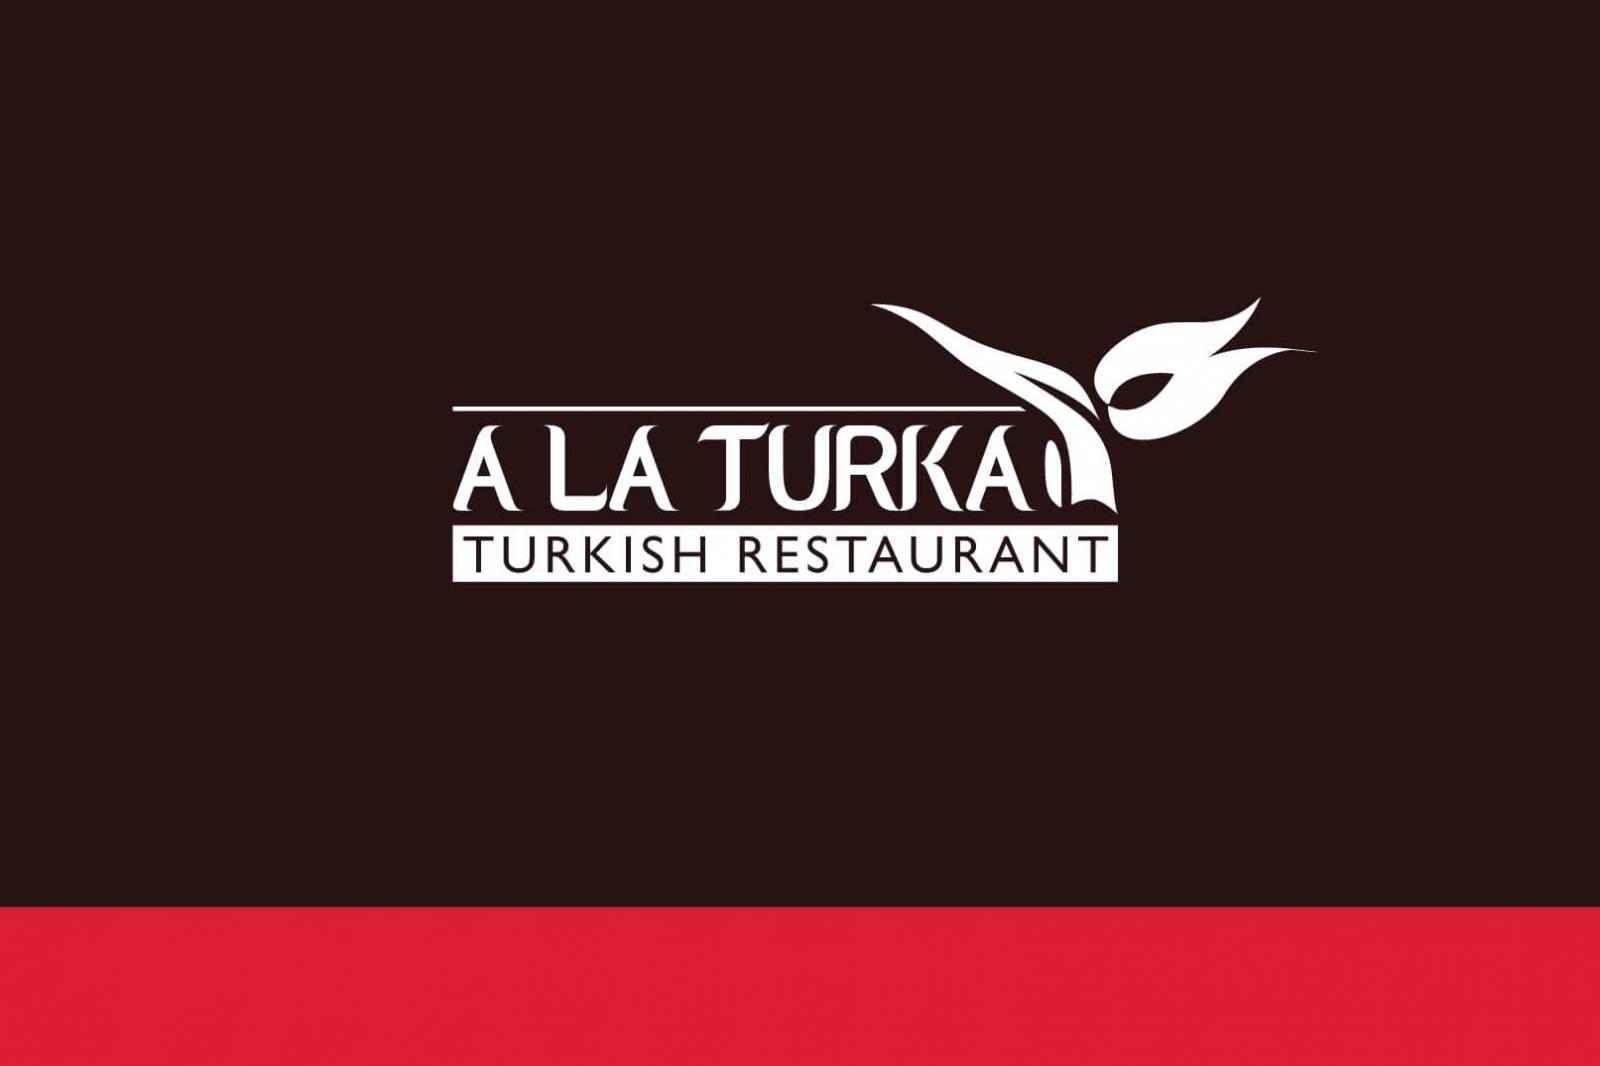 A-la-turka-logo-design-agency-graphic-design-canterbury.jpg